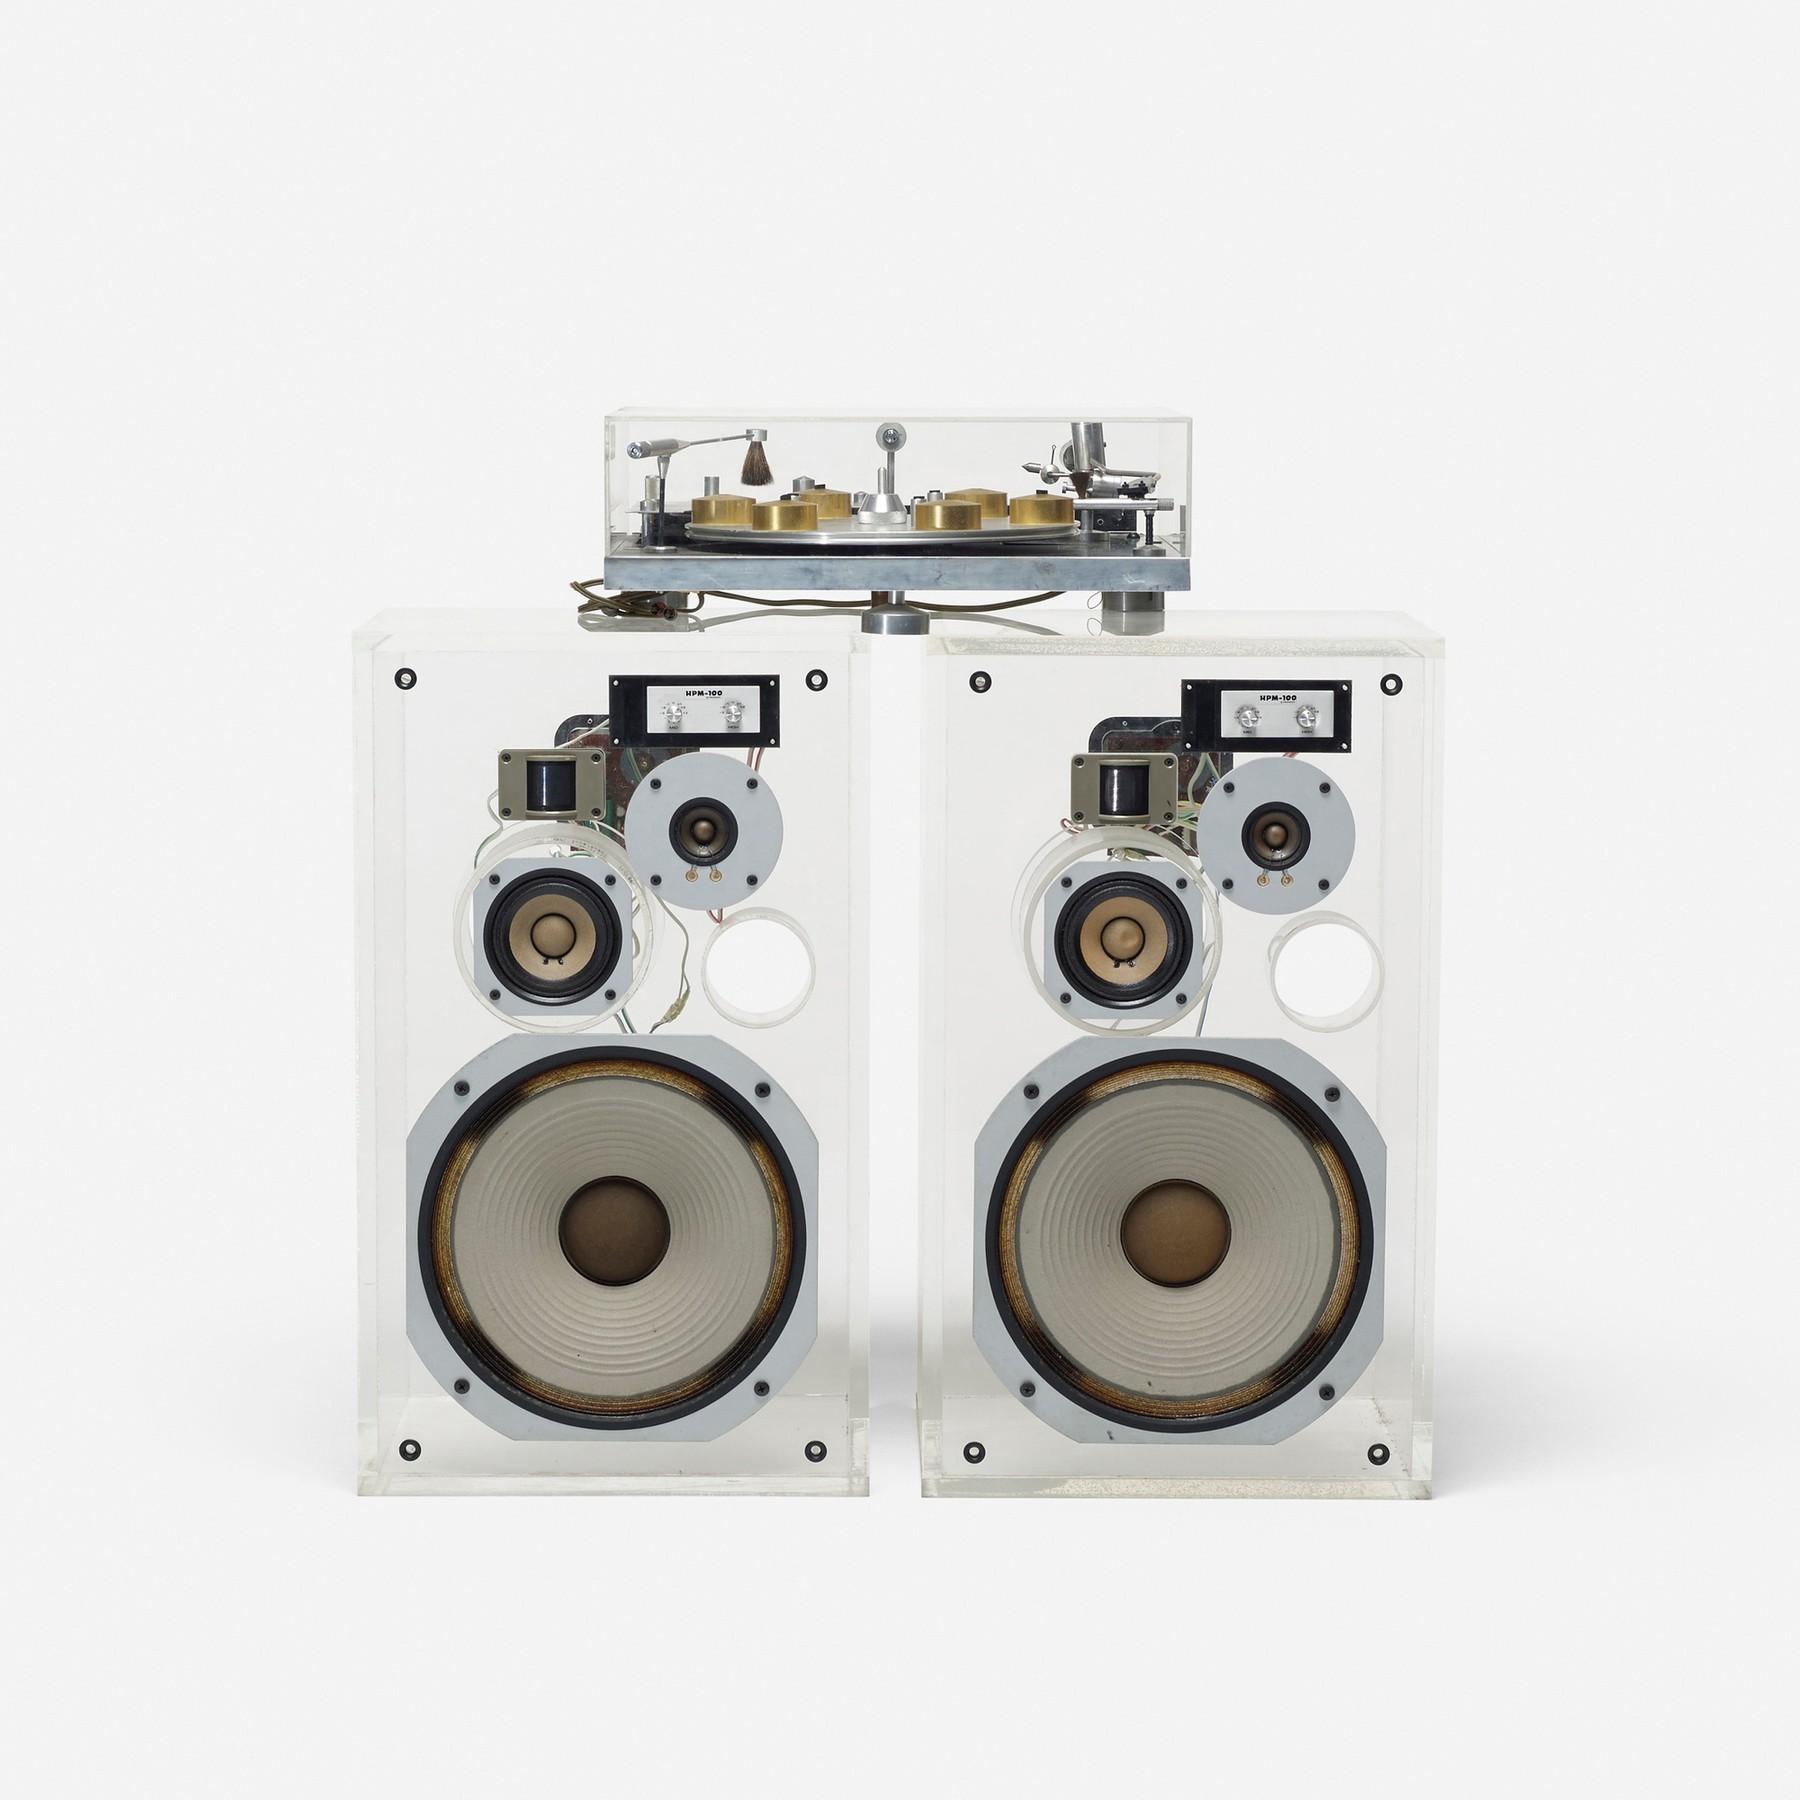 230_2_art_design_september_2015_ja_michell_engineering_ltd_reference_hydraulic_transcription_turntable__wright_auction.jpg?t...